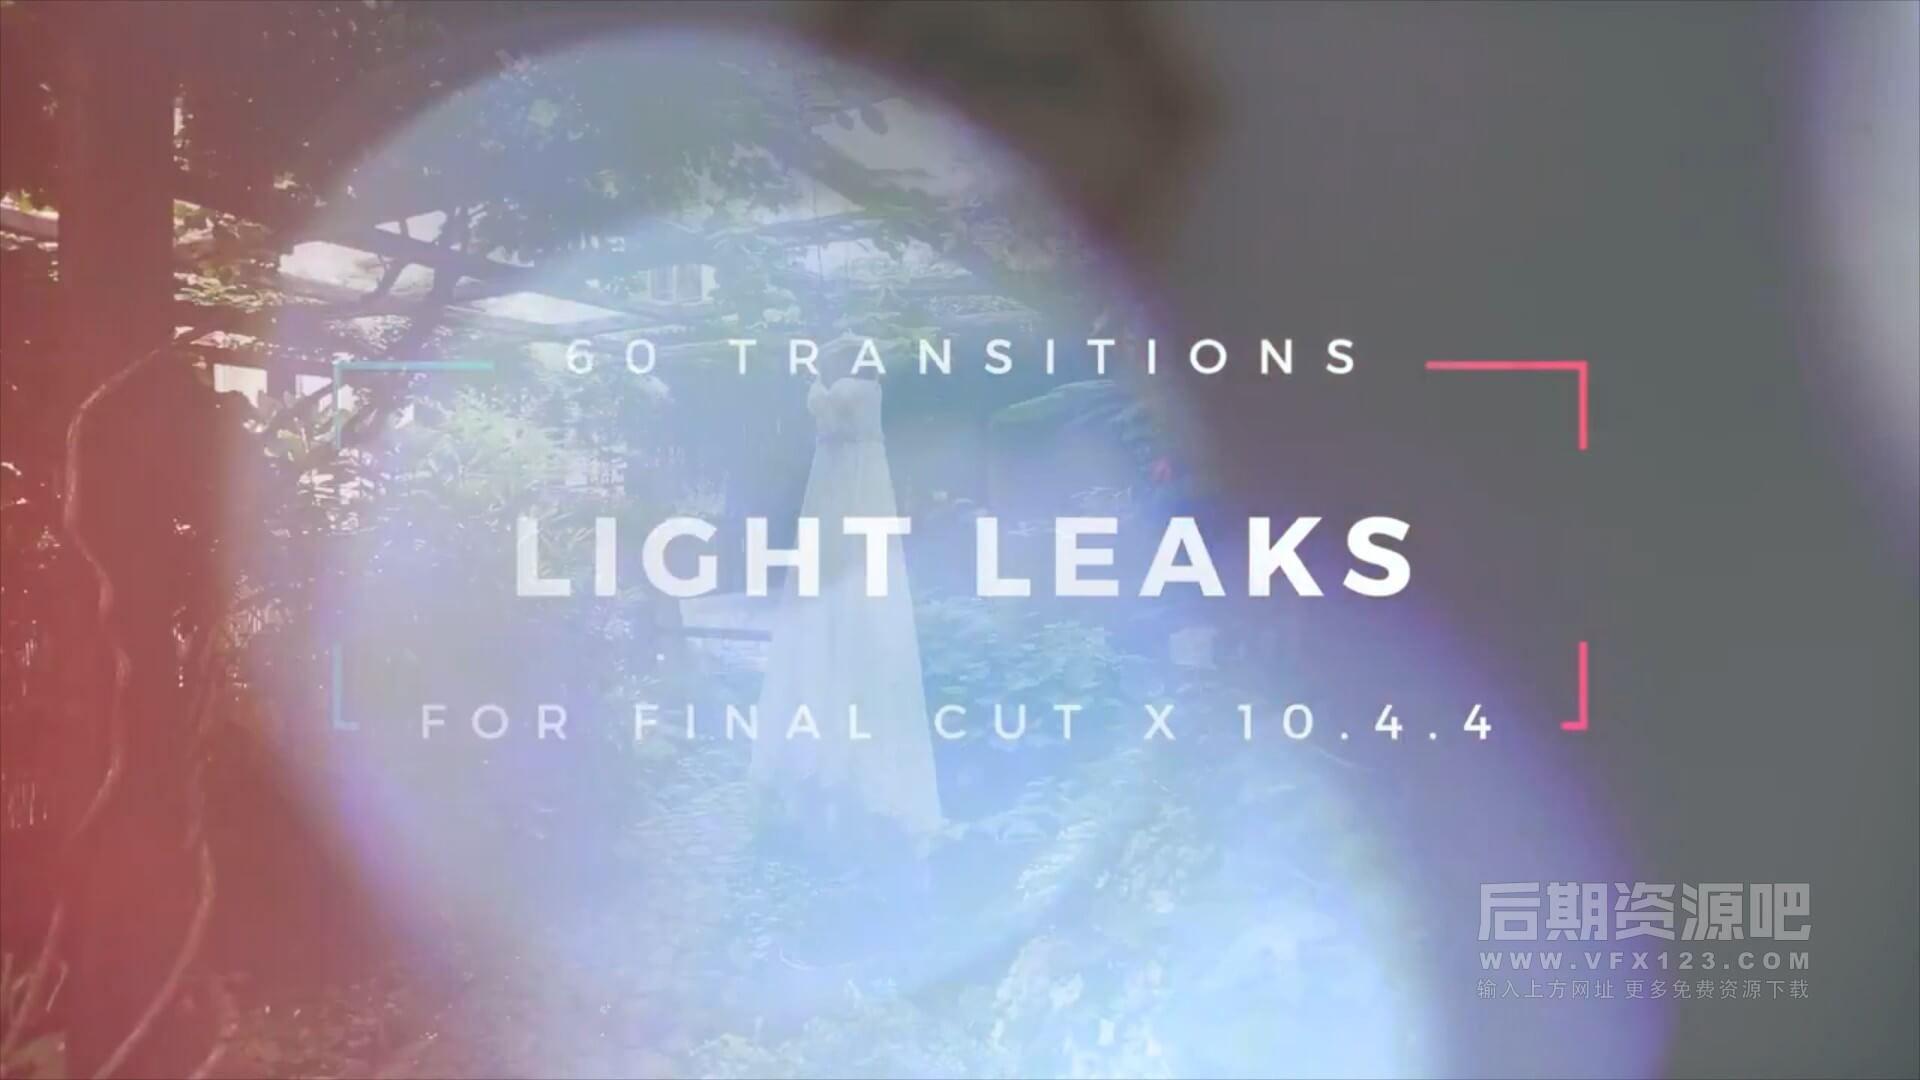 Fcpx转场插件 60组浪漫氛围光晕光斑婚礼MV影片过渡转场 Light leaks transitions